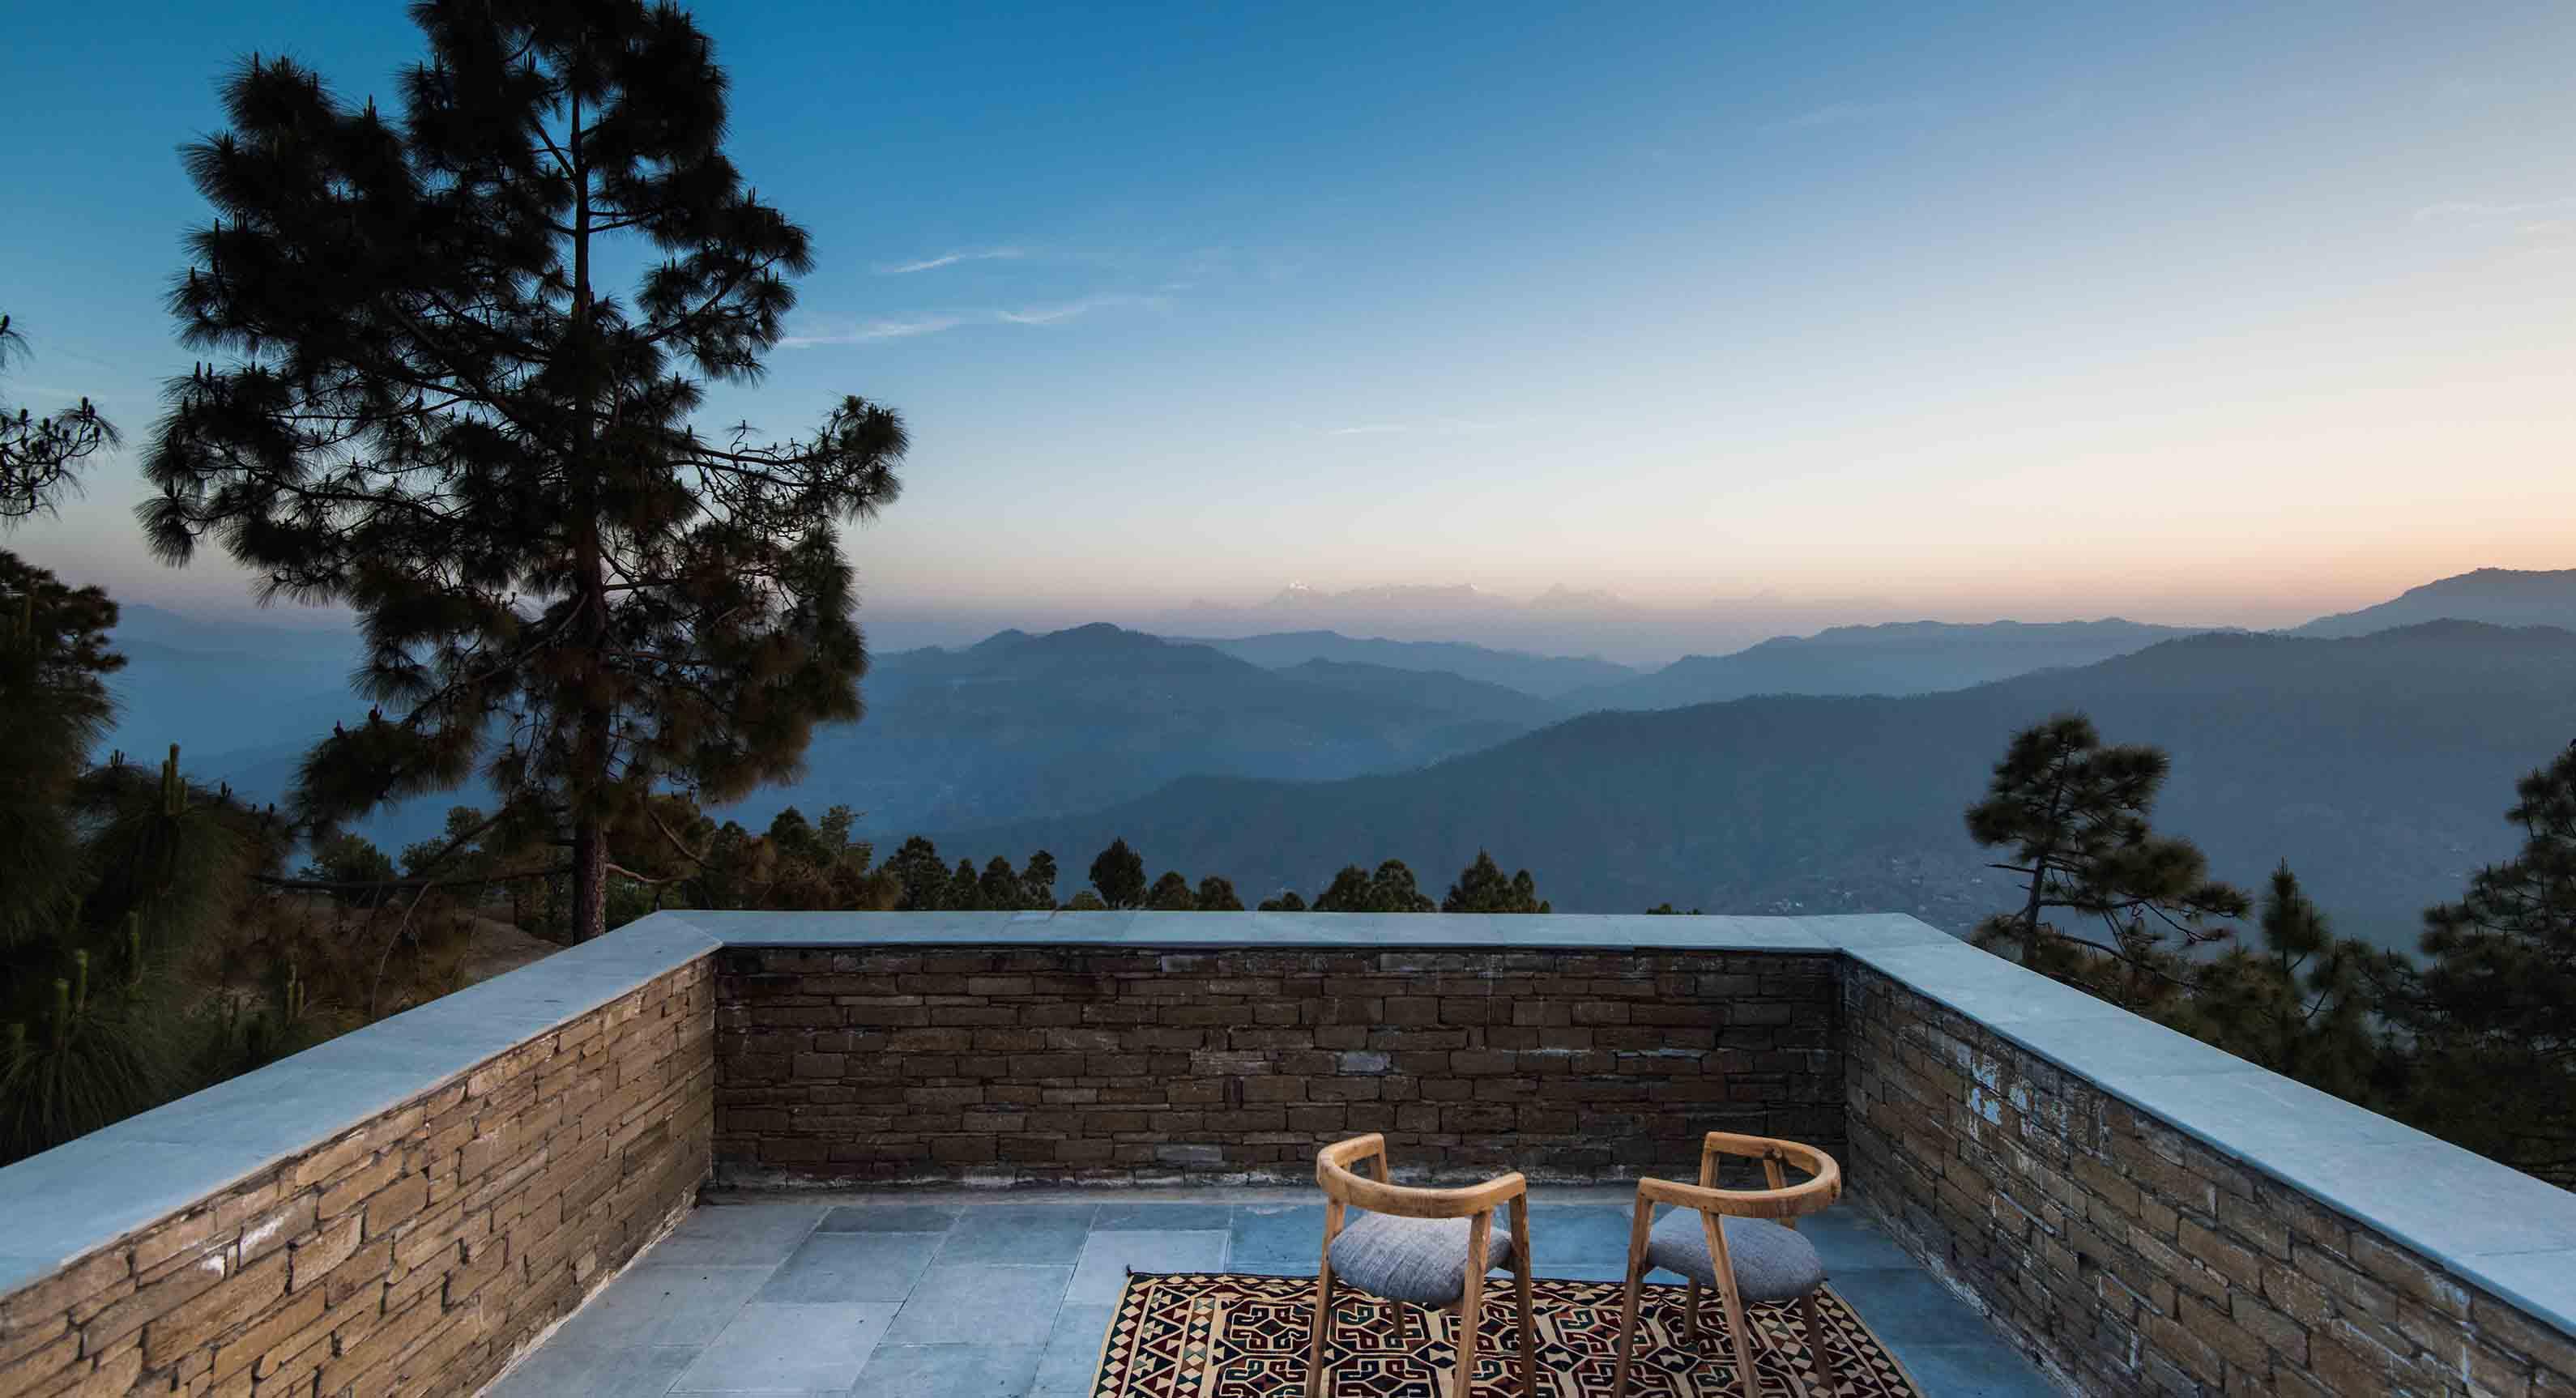 The Kumaon Hotel: The Minimalist Jungle Retreat Hidden In The Himalayas